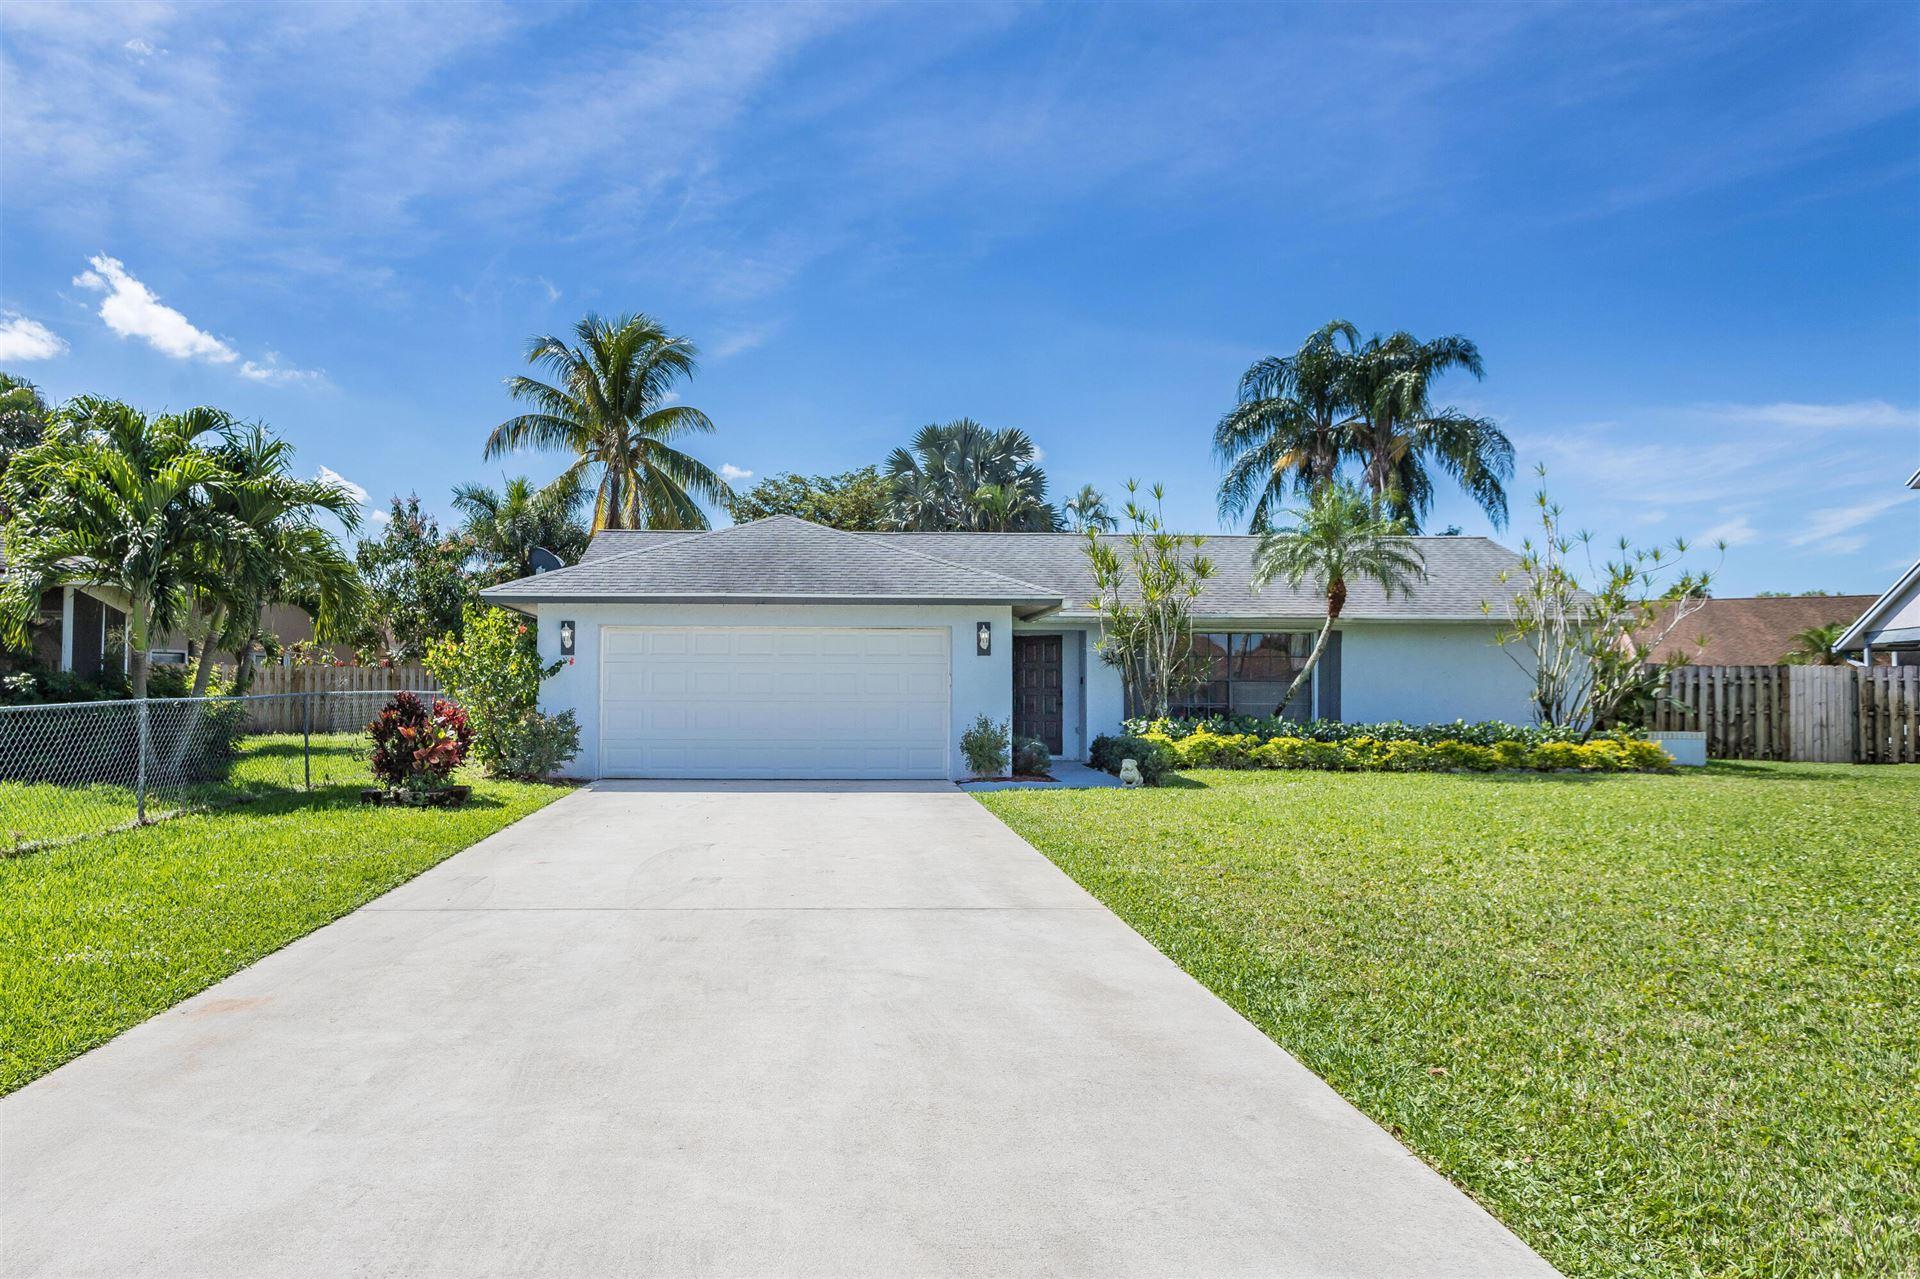 6296 Madras Circle, Boynton Beach, FL 33437 - #: RX-10719661